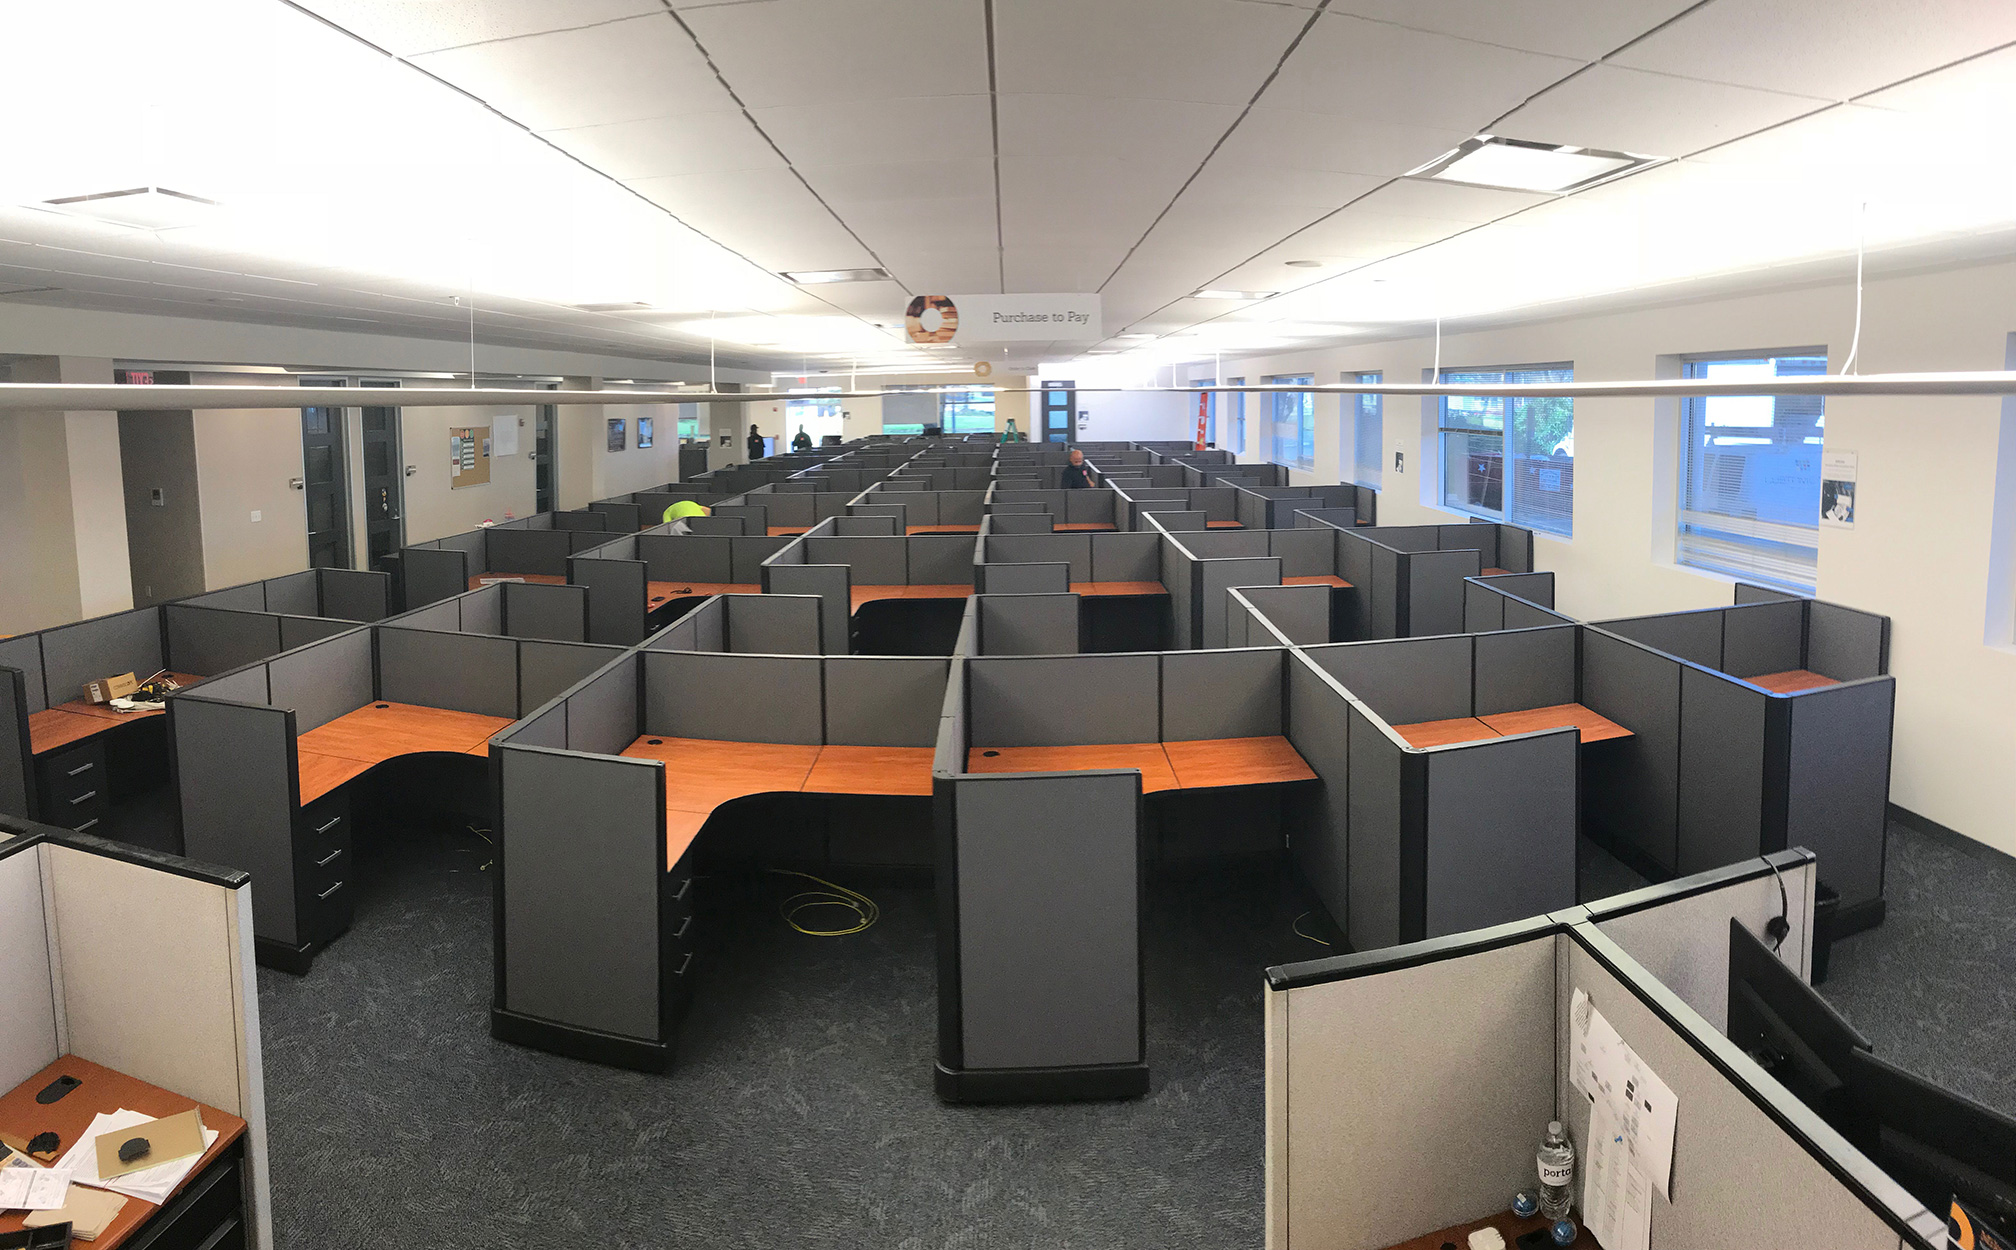 office-cubicles-for-sale-in-tarpon-springs-florida-2.jpg